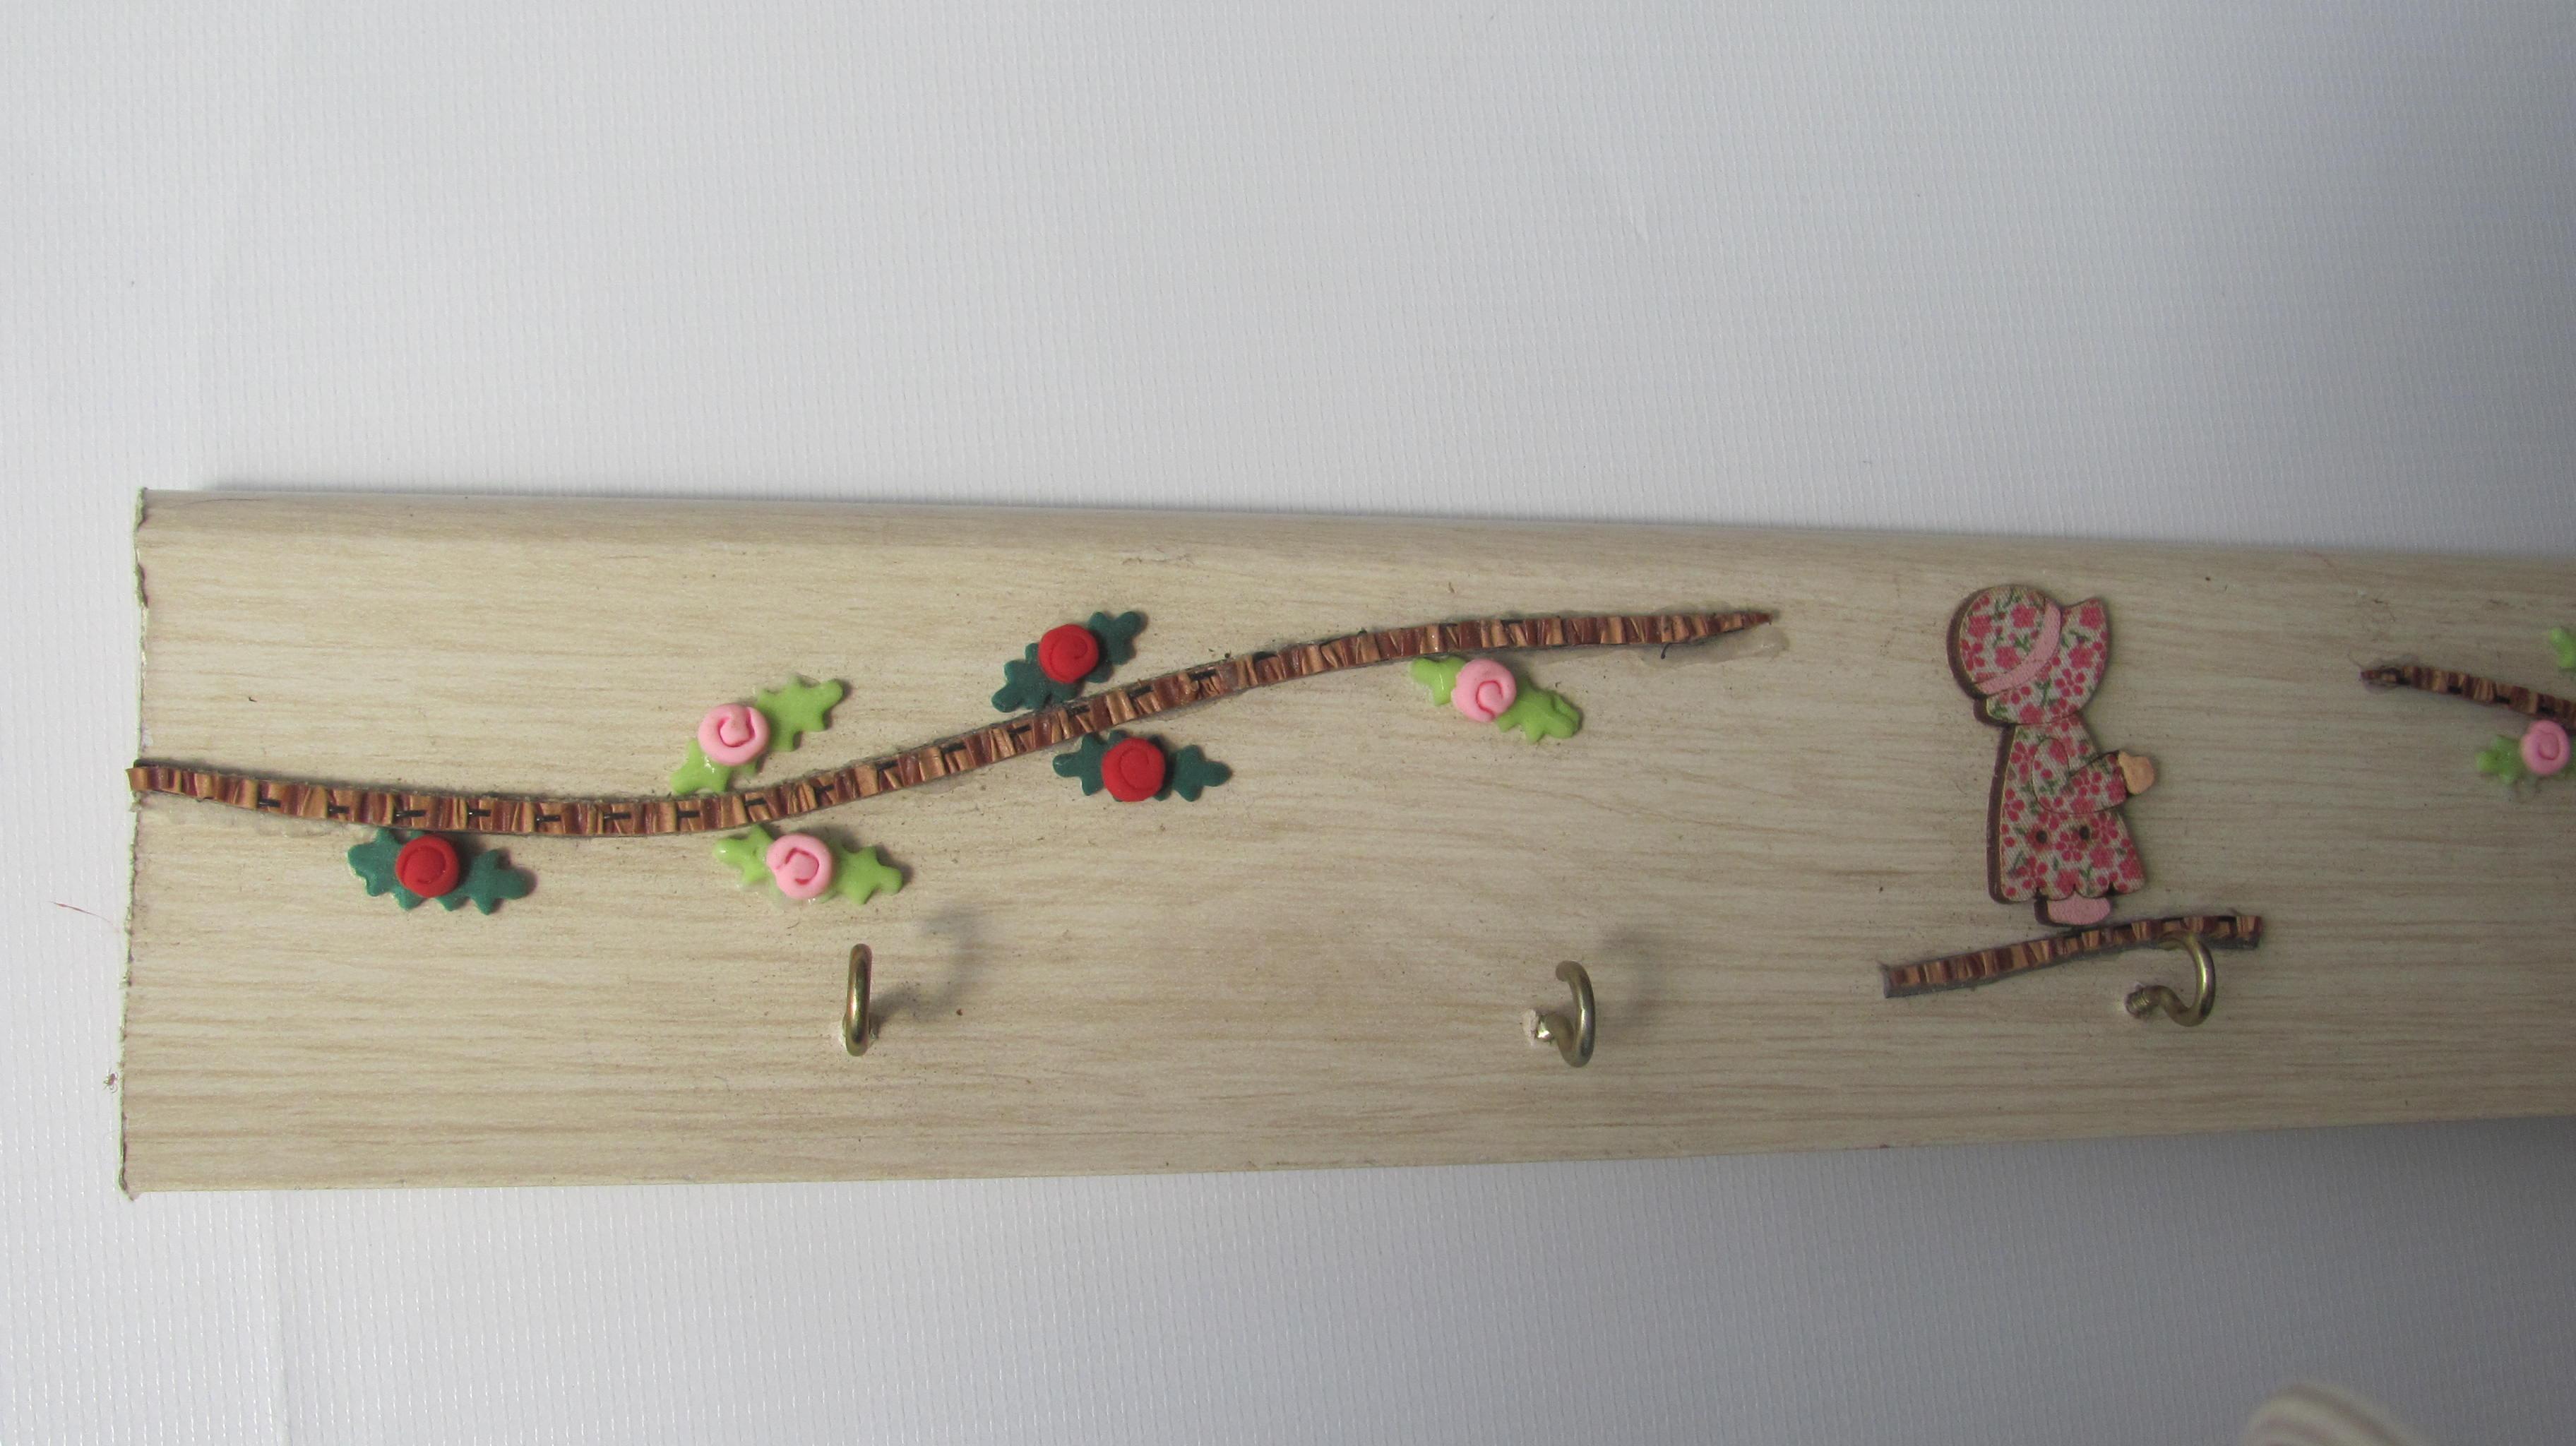 chaves de madeira porta chaves de madeira porta chaves de madeira #738844 3648x2048